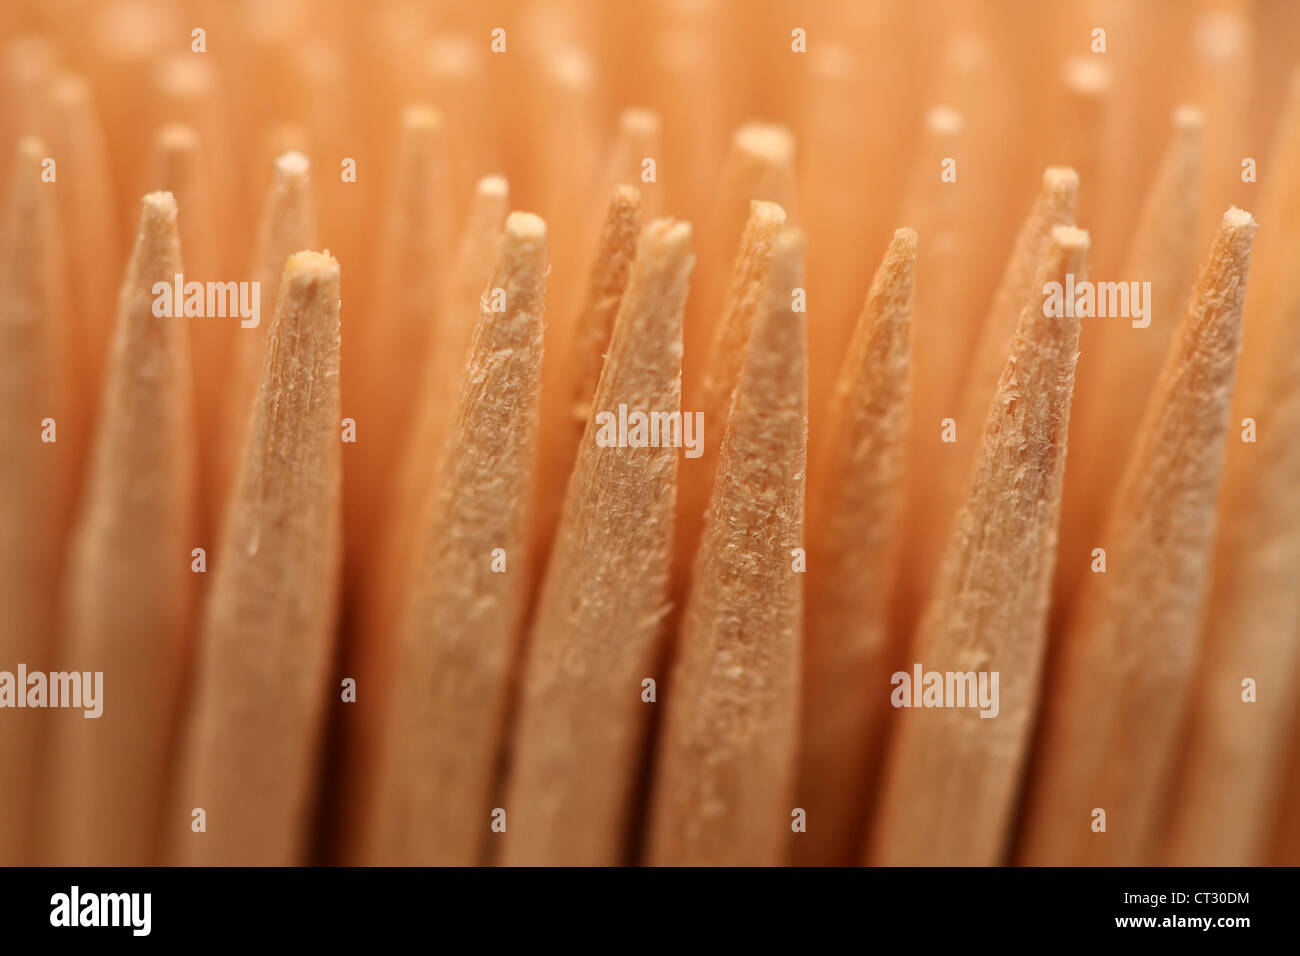 Toothpicks - Stock Image